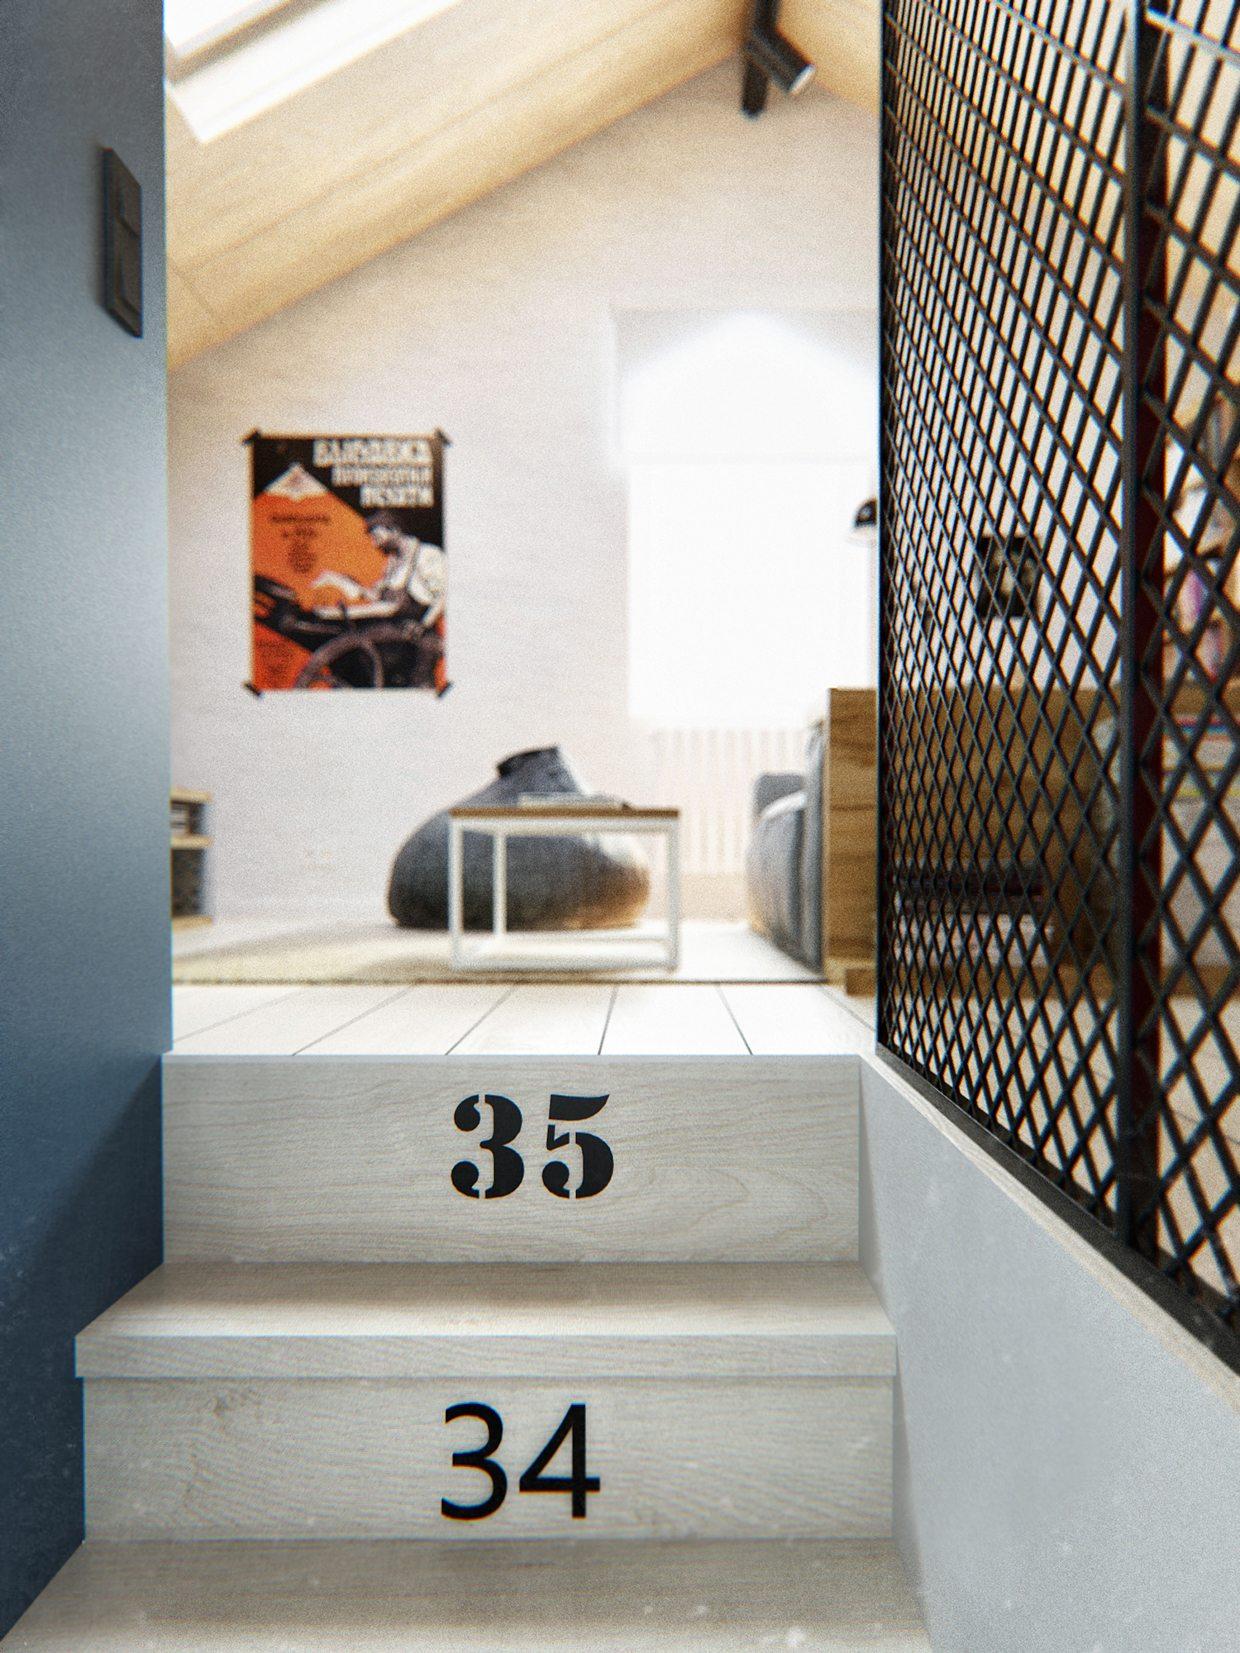 Duplex Penthouse With Scandinavian Aesthetics Amp Industrial Elements